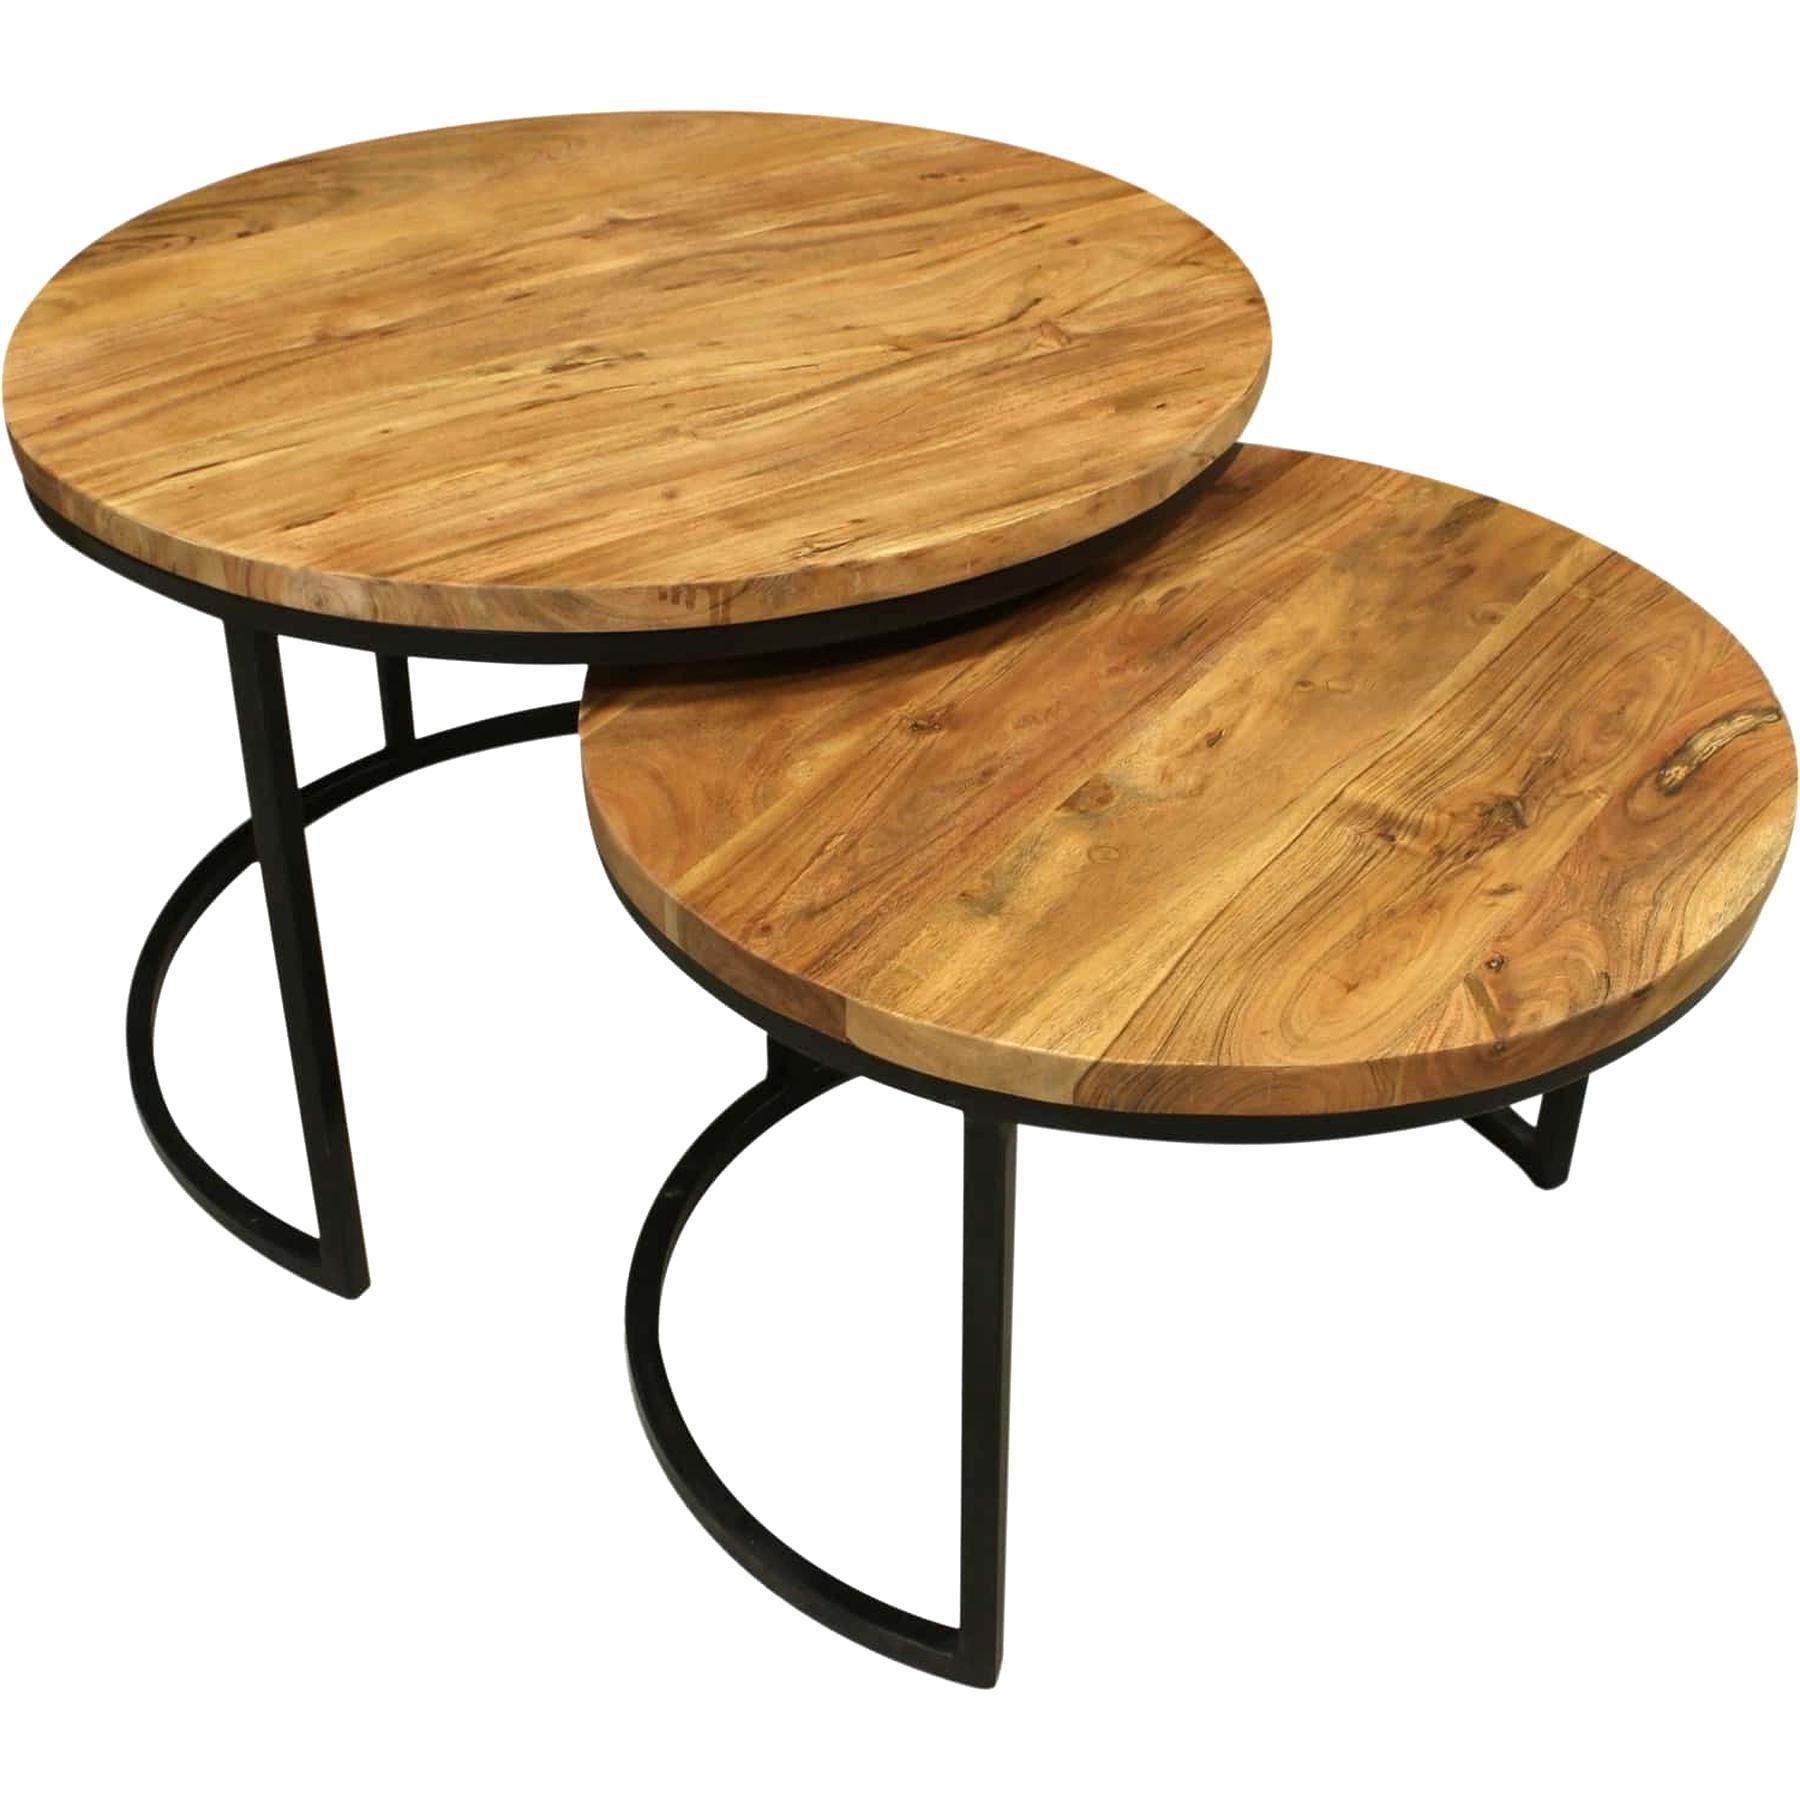 Table Basse Gigogne Bois.Table Basse Gigogne Bois